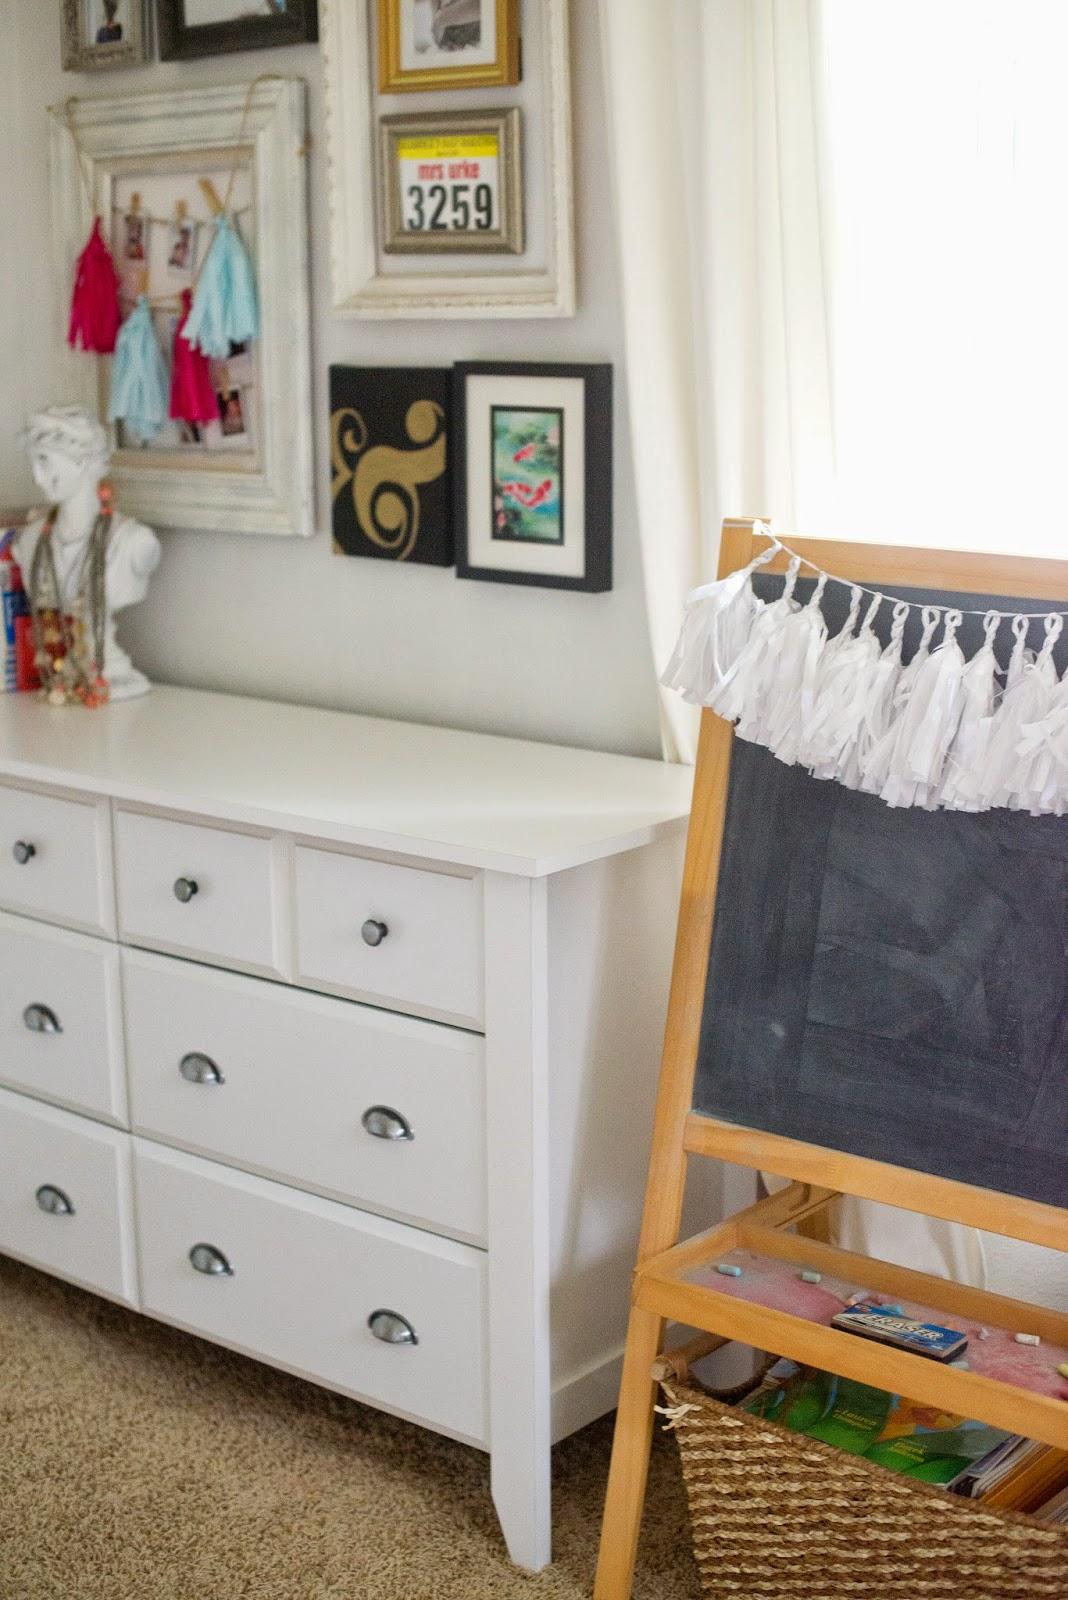 Domestic Fashionista Styling a Dresser Two Ways